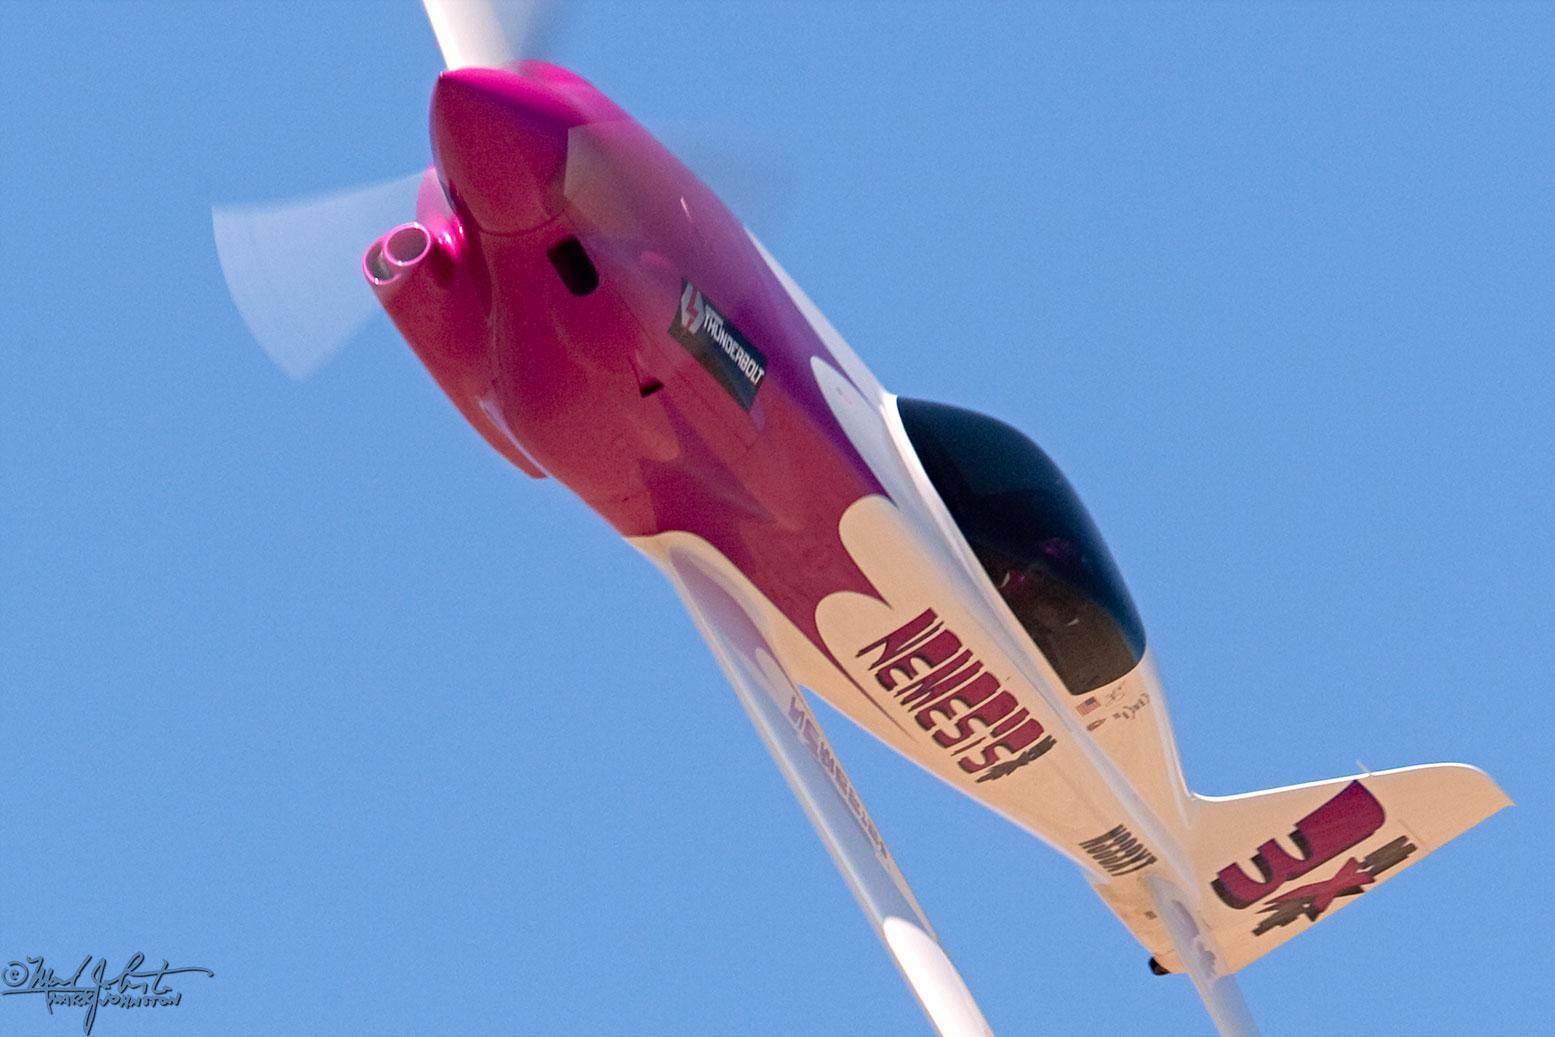 Sport Class aircraft at the Reno Air Races.